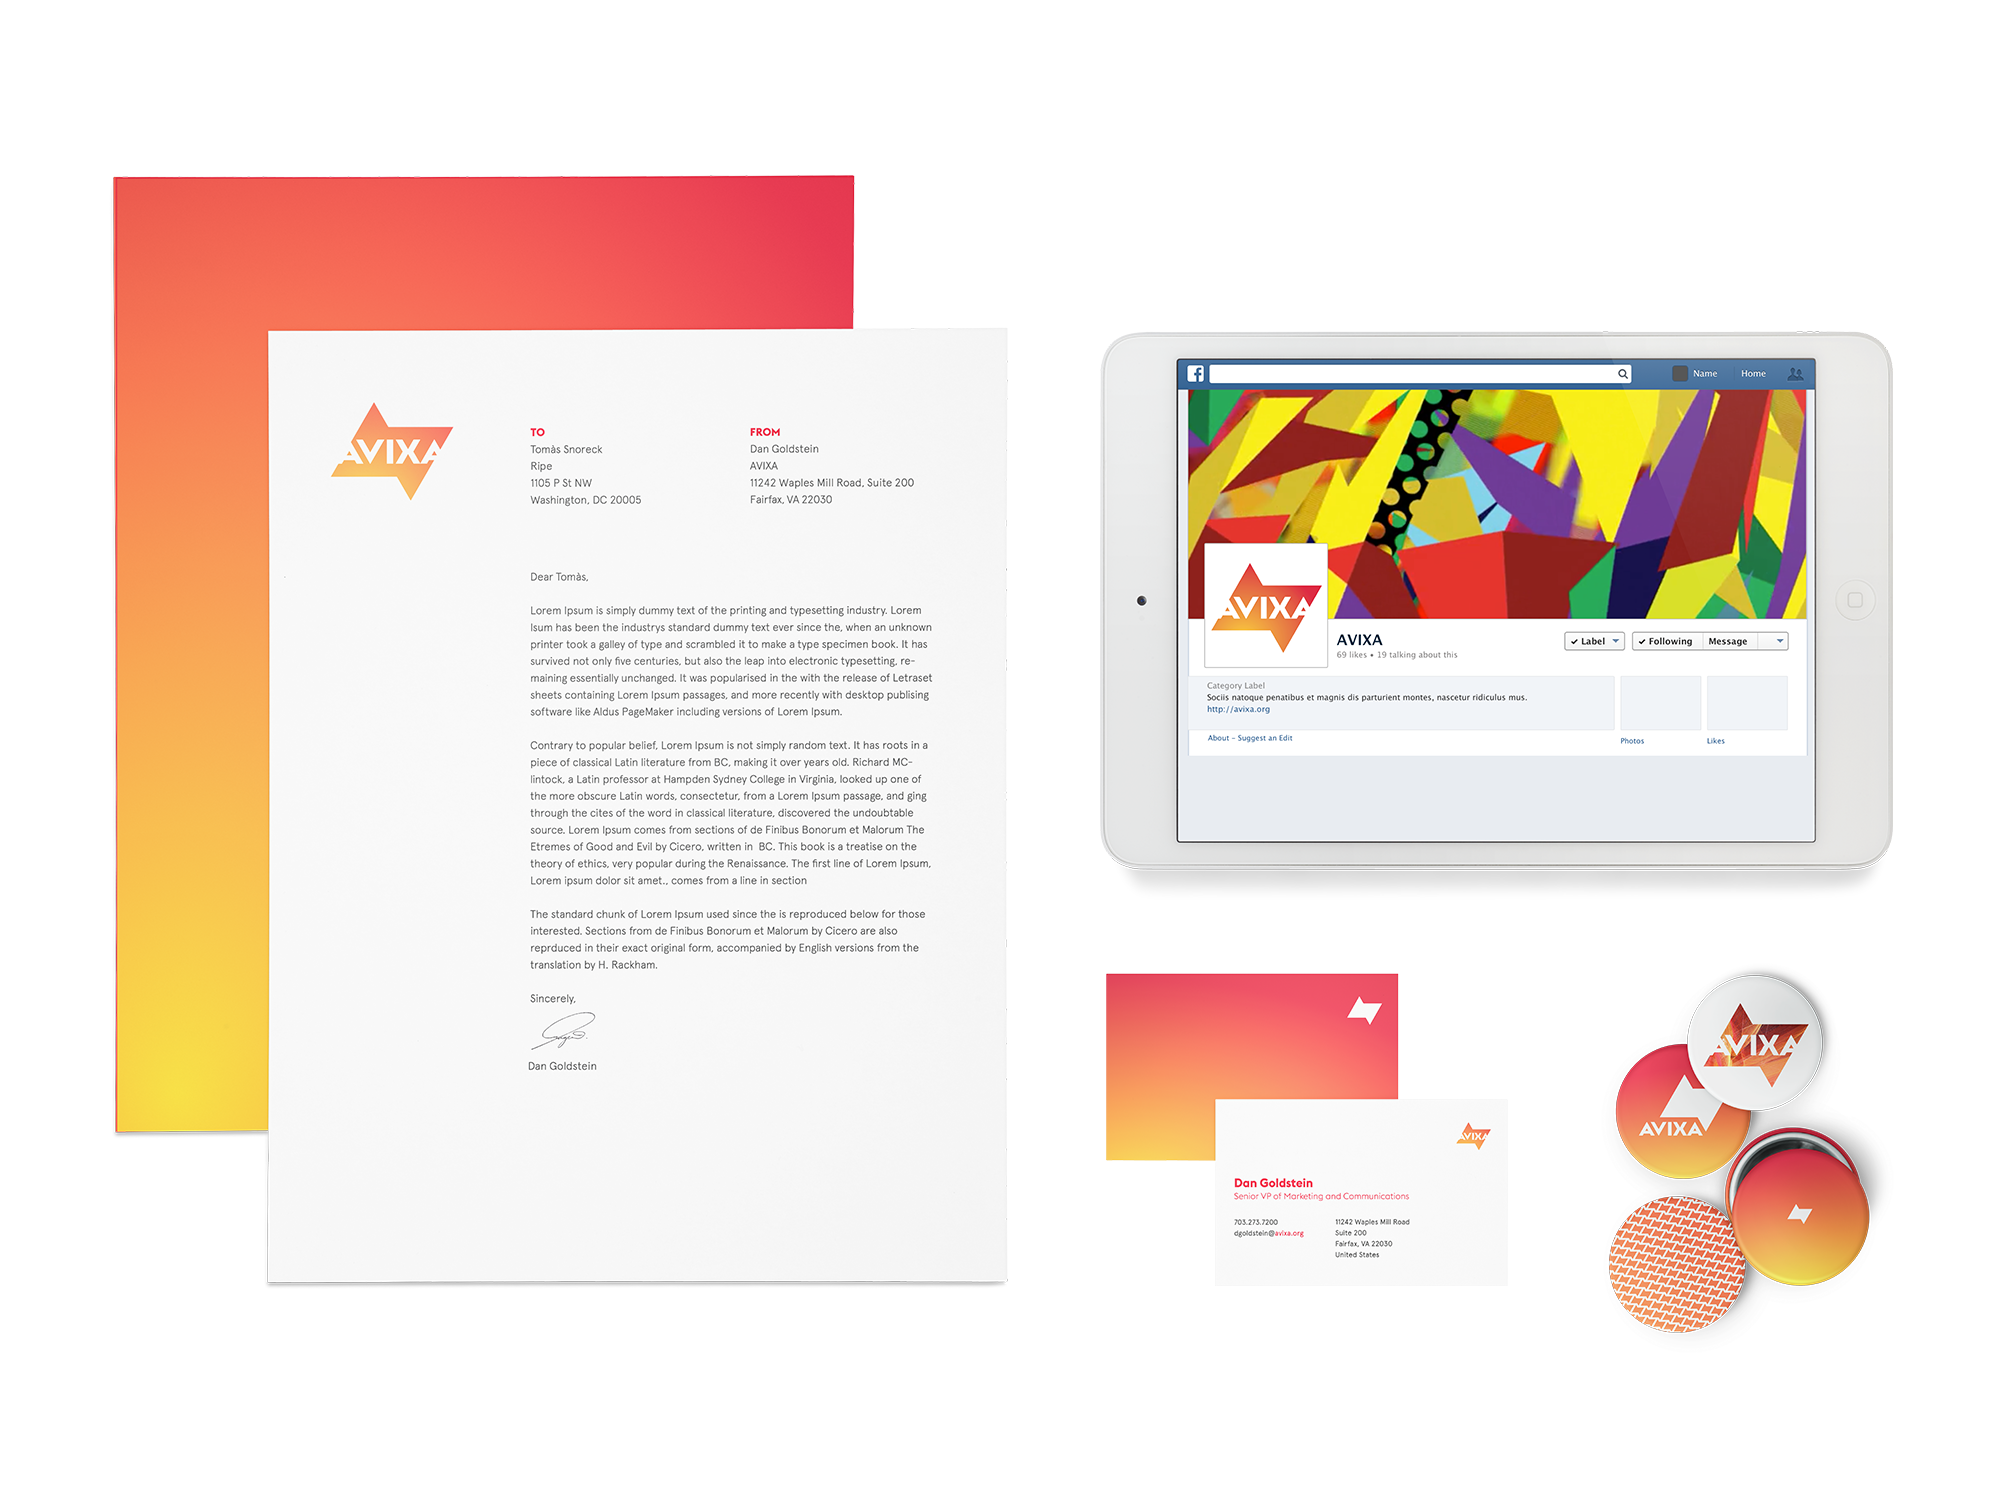 avixa-application-document_system.png